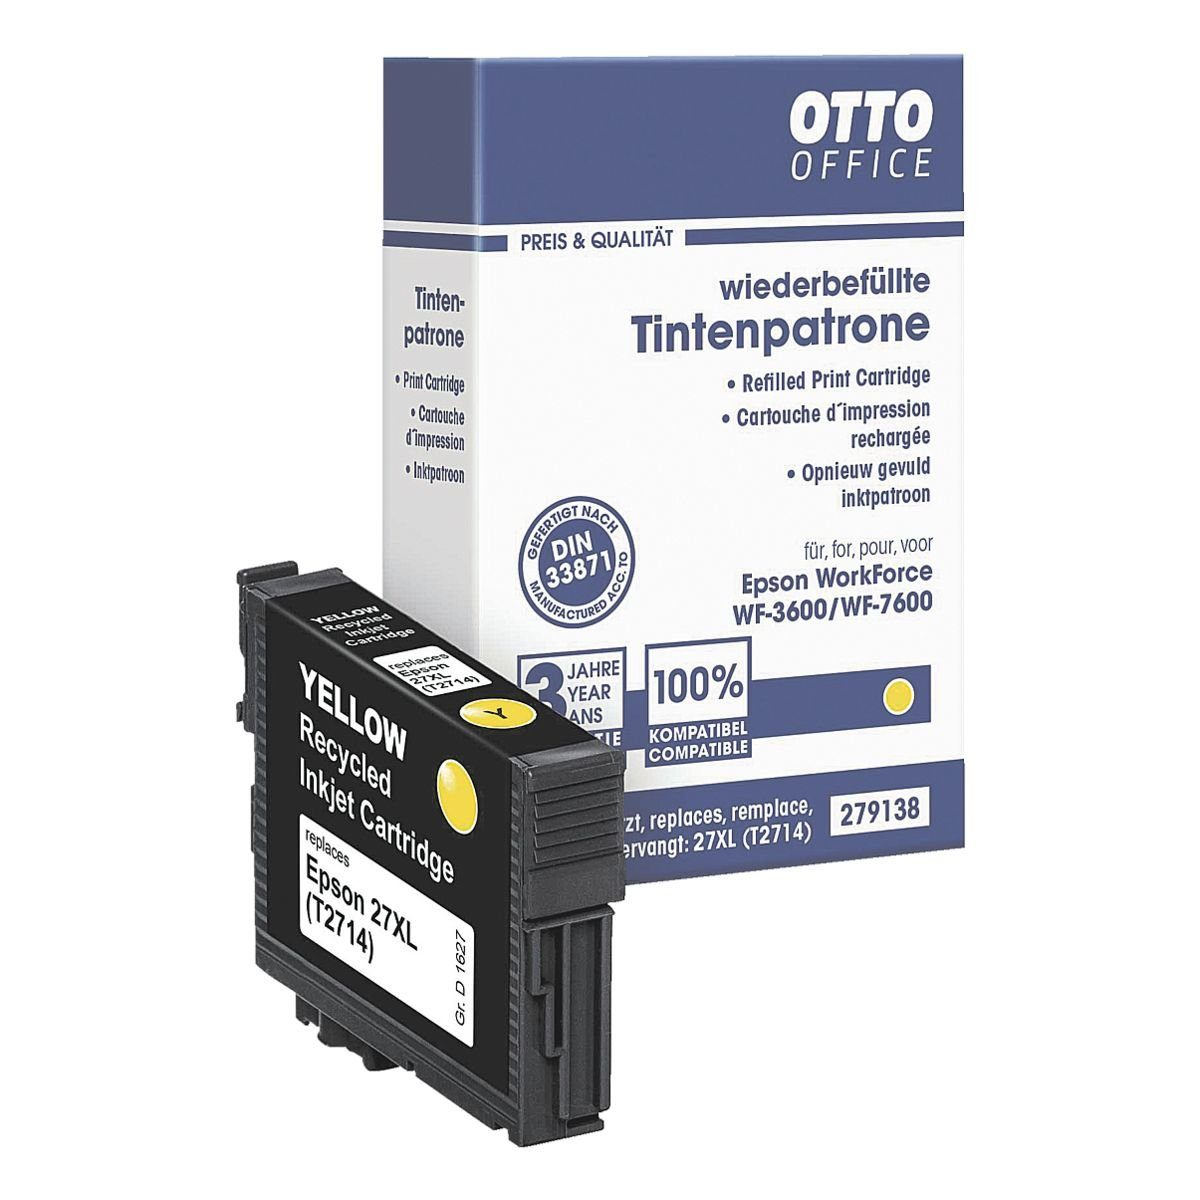 OTTO Office Standard Tintenpatrone ersetzt Epson »T2714 XL«